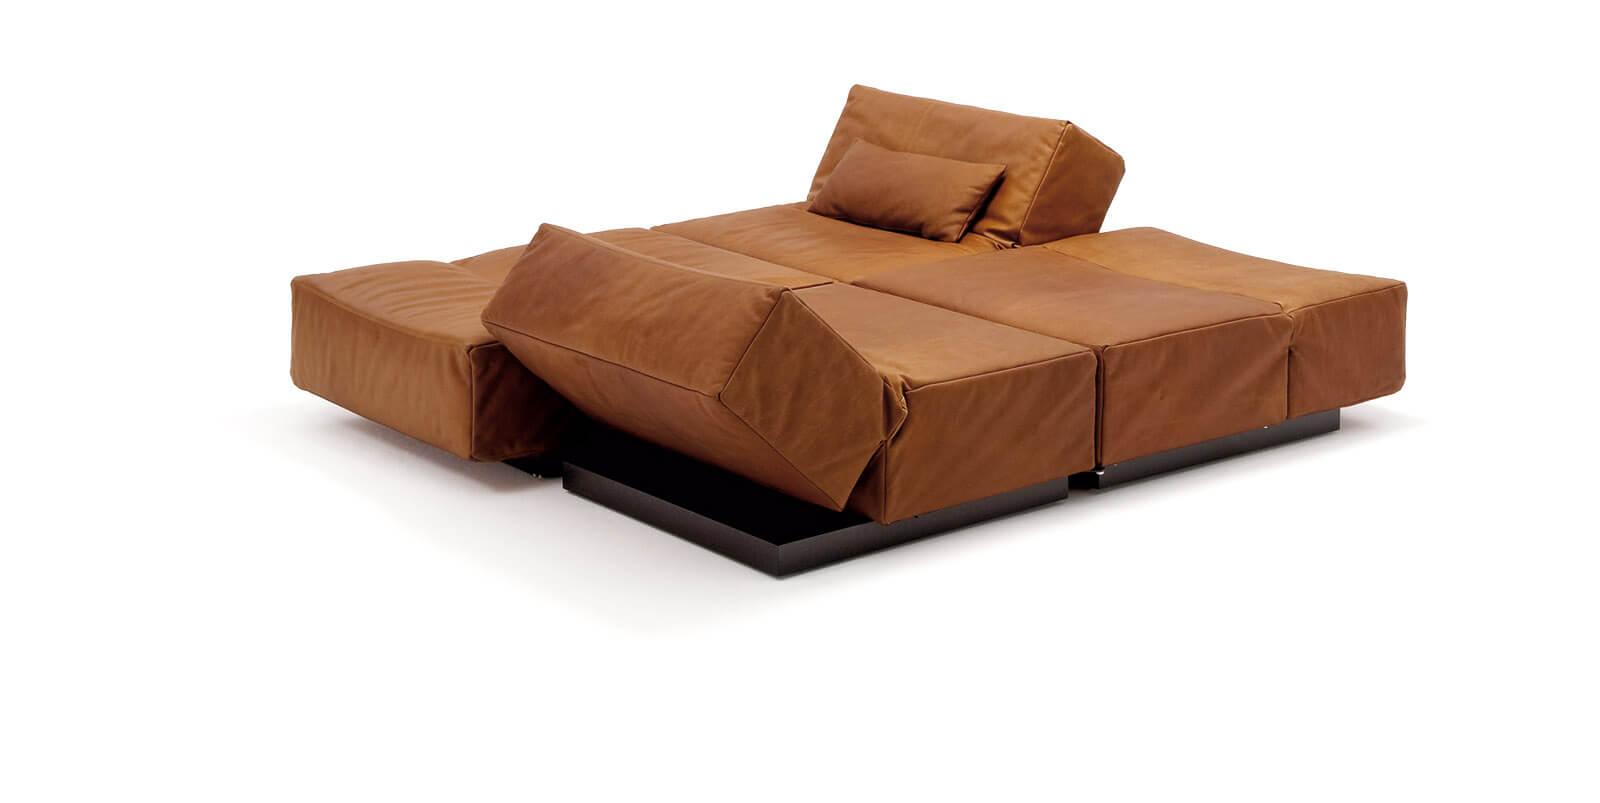 tema sectional sofa bed. Black Bedroom Furniture Sets. Home Design Ideas